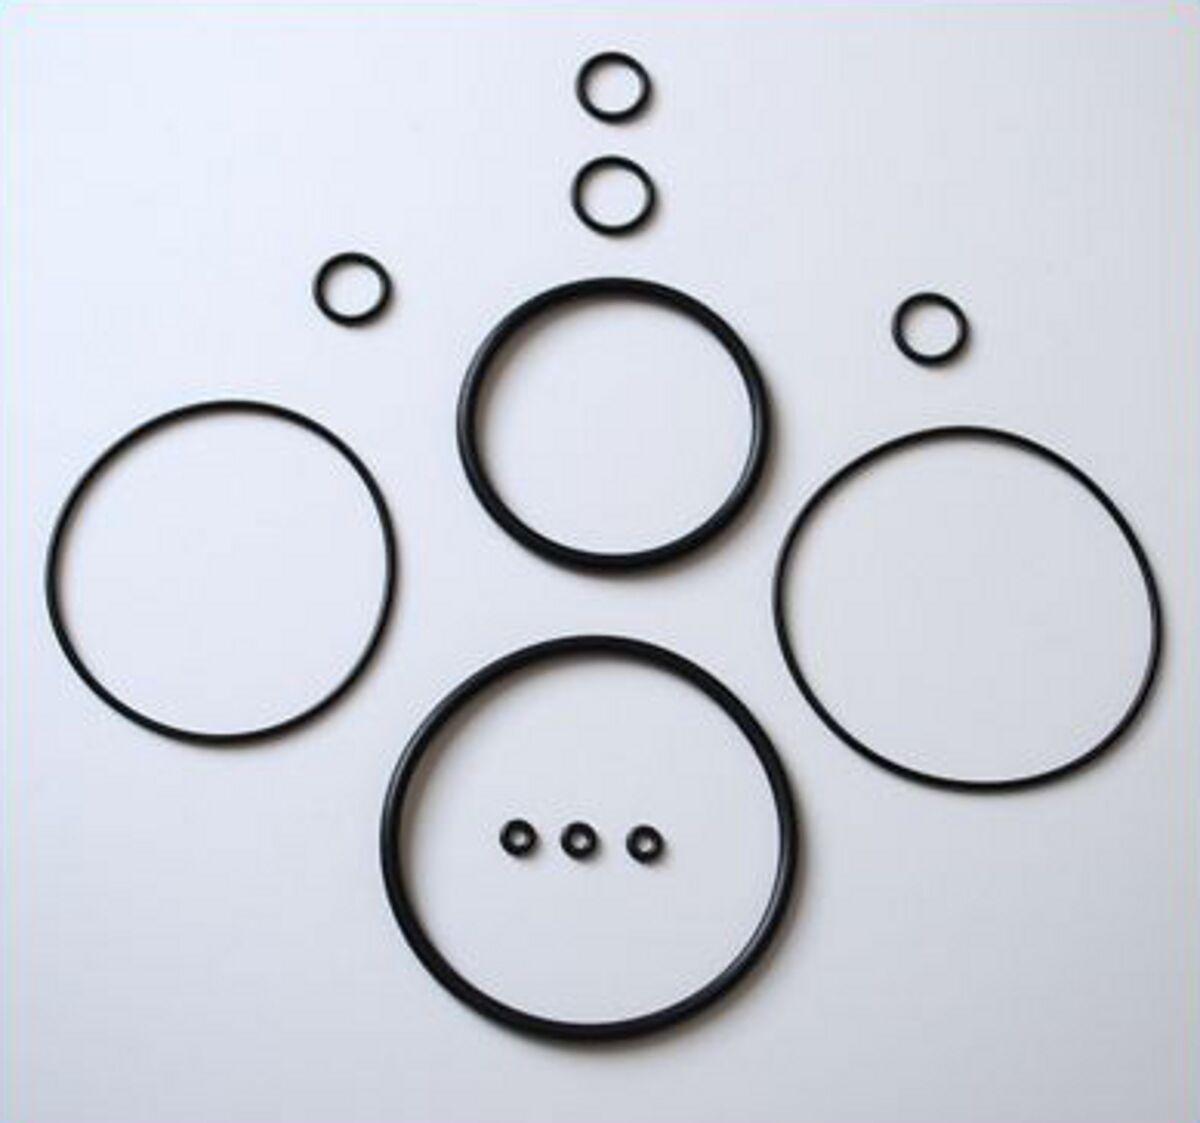 Hilti Rn-312 Framing Nailer O Ring Kit